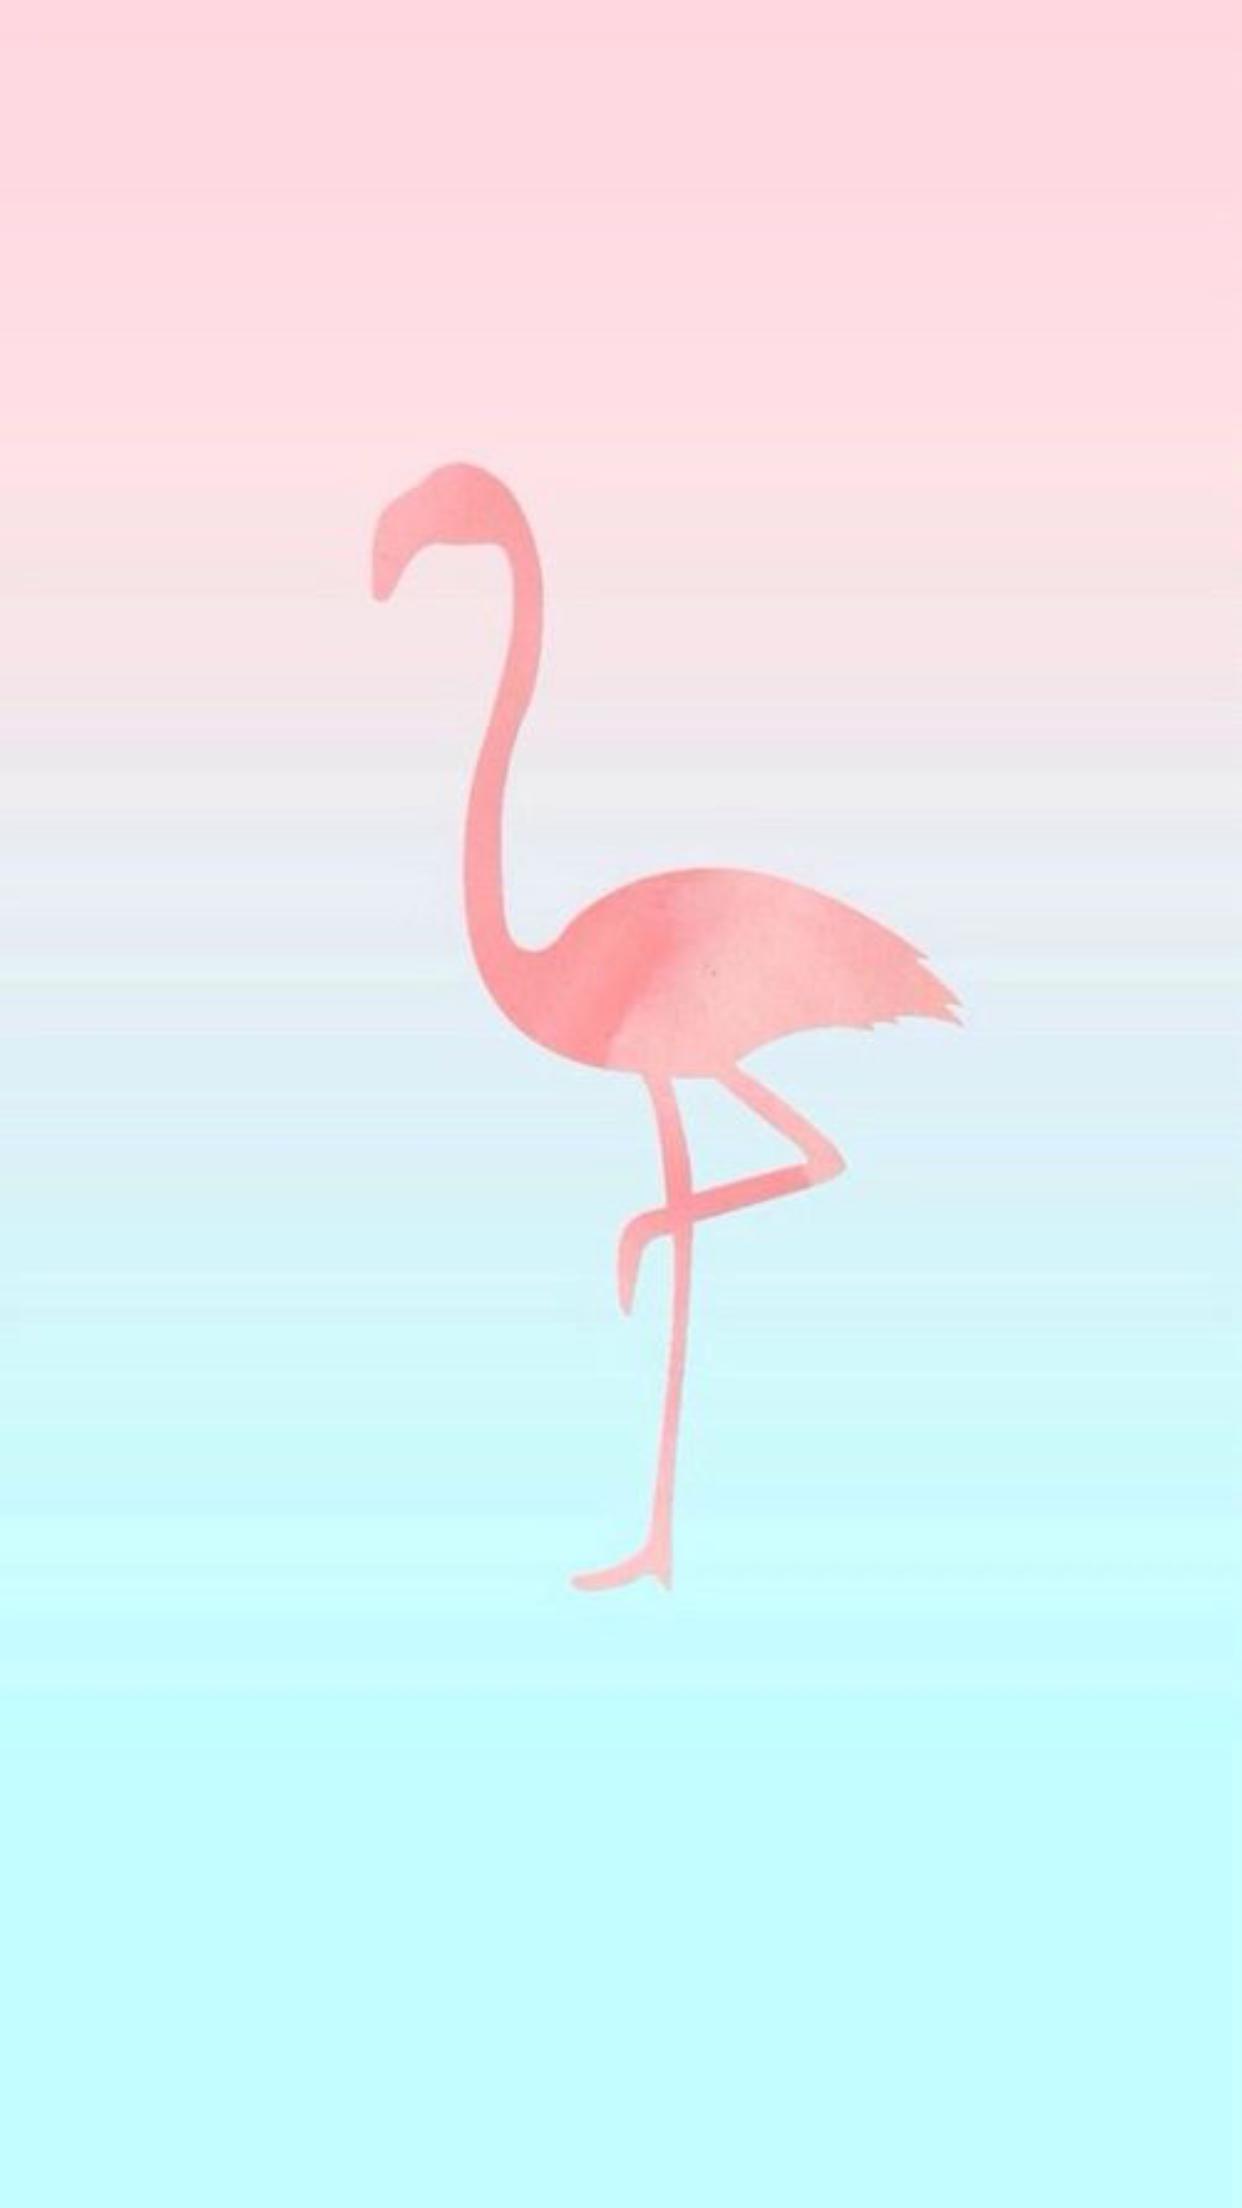 Tech Wallpapers in 2020 Flamingo wallpaper, Iphone